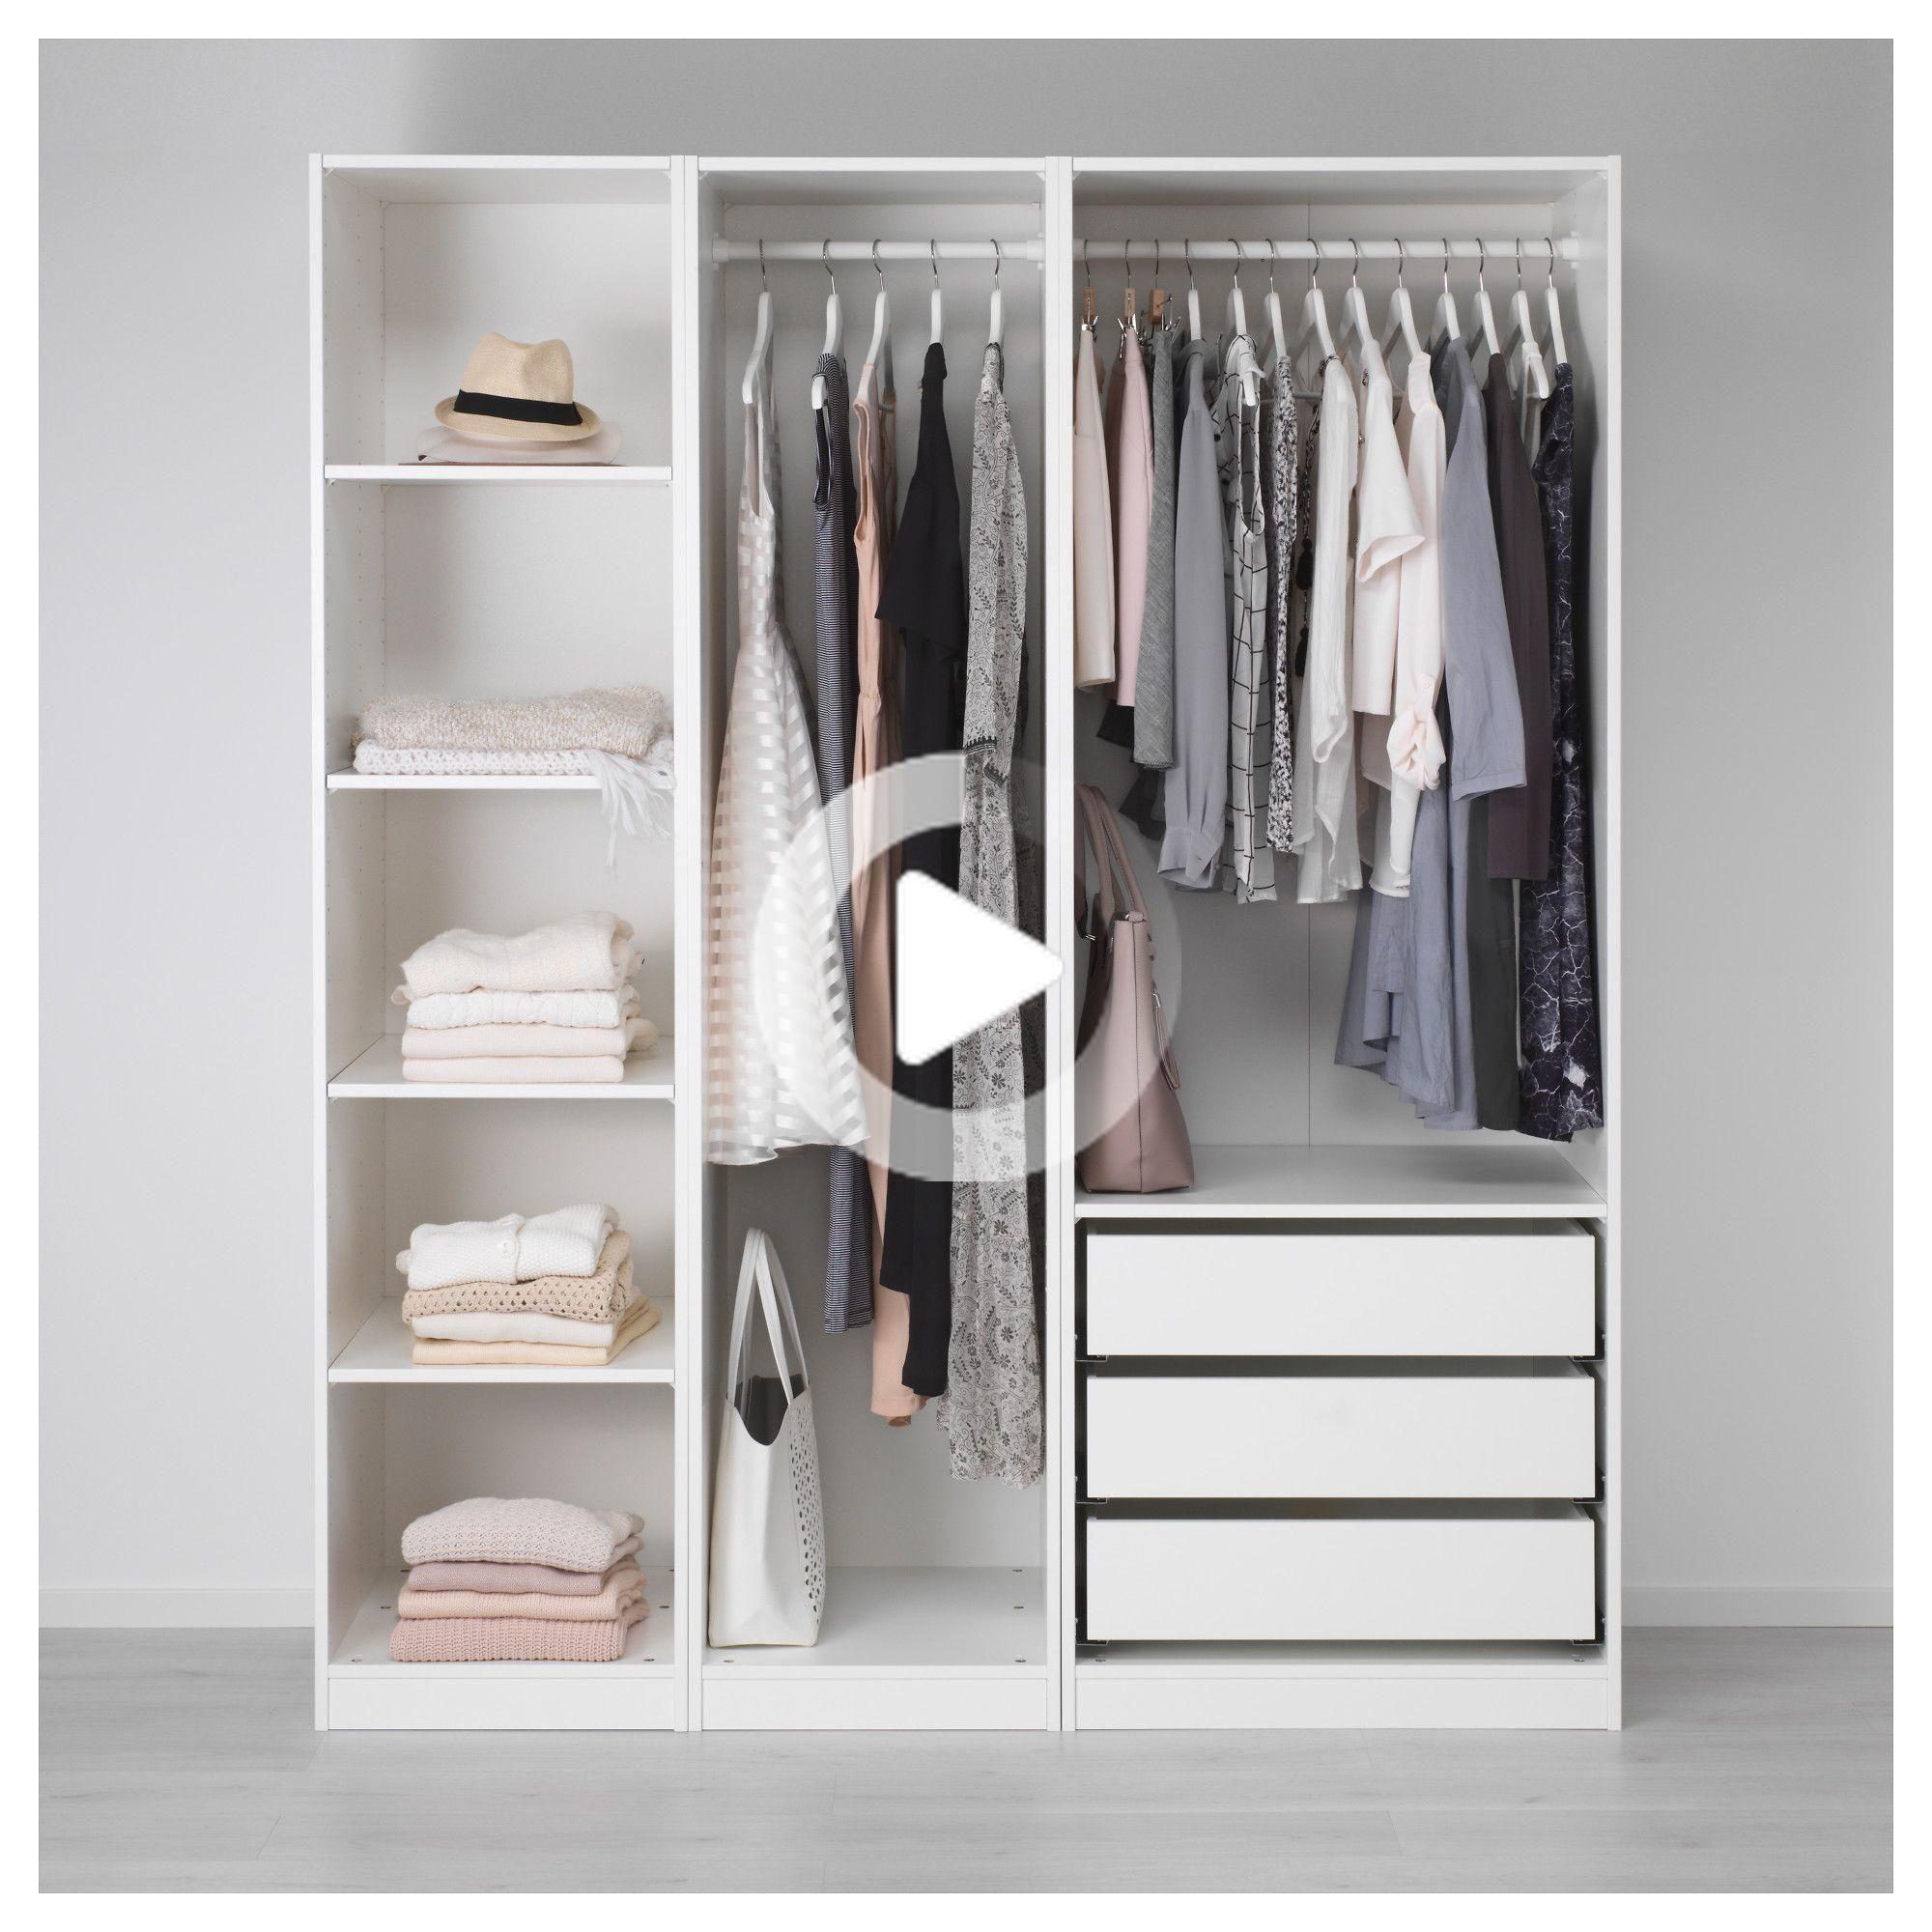 Pax Wardrobe White 68 7 8x22 7 8x79 1 4 Ikea In 2020 Ikea